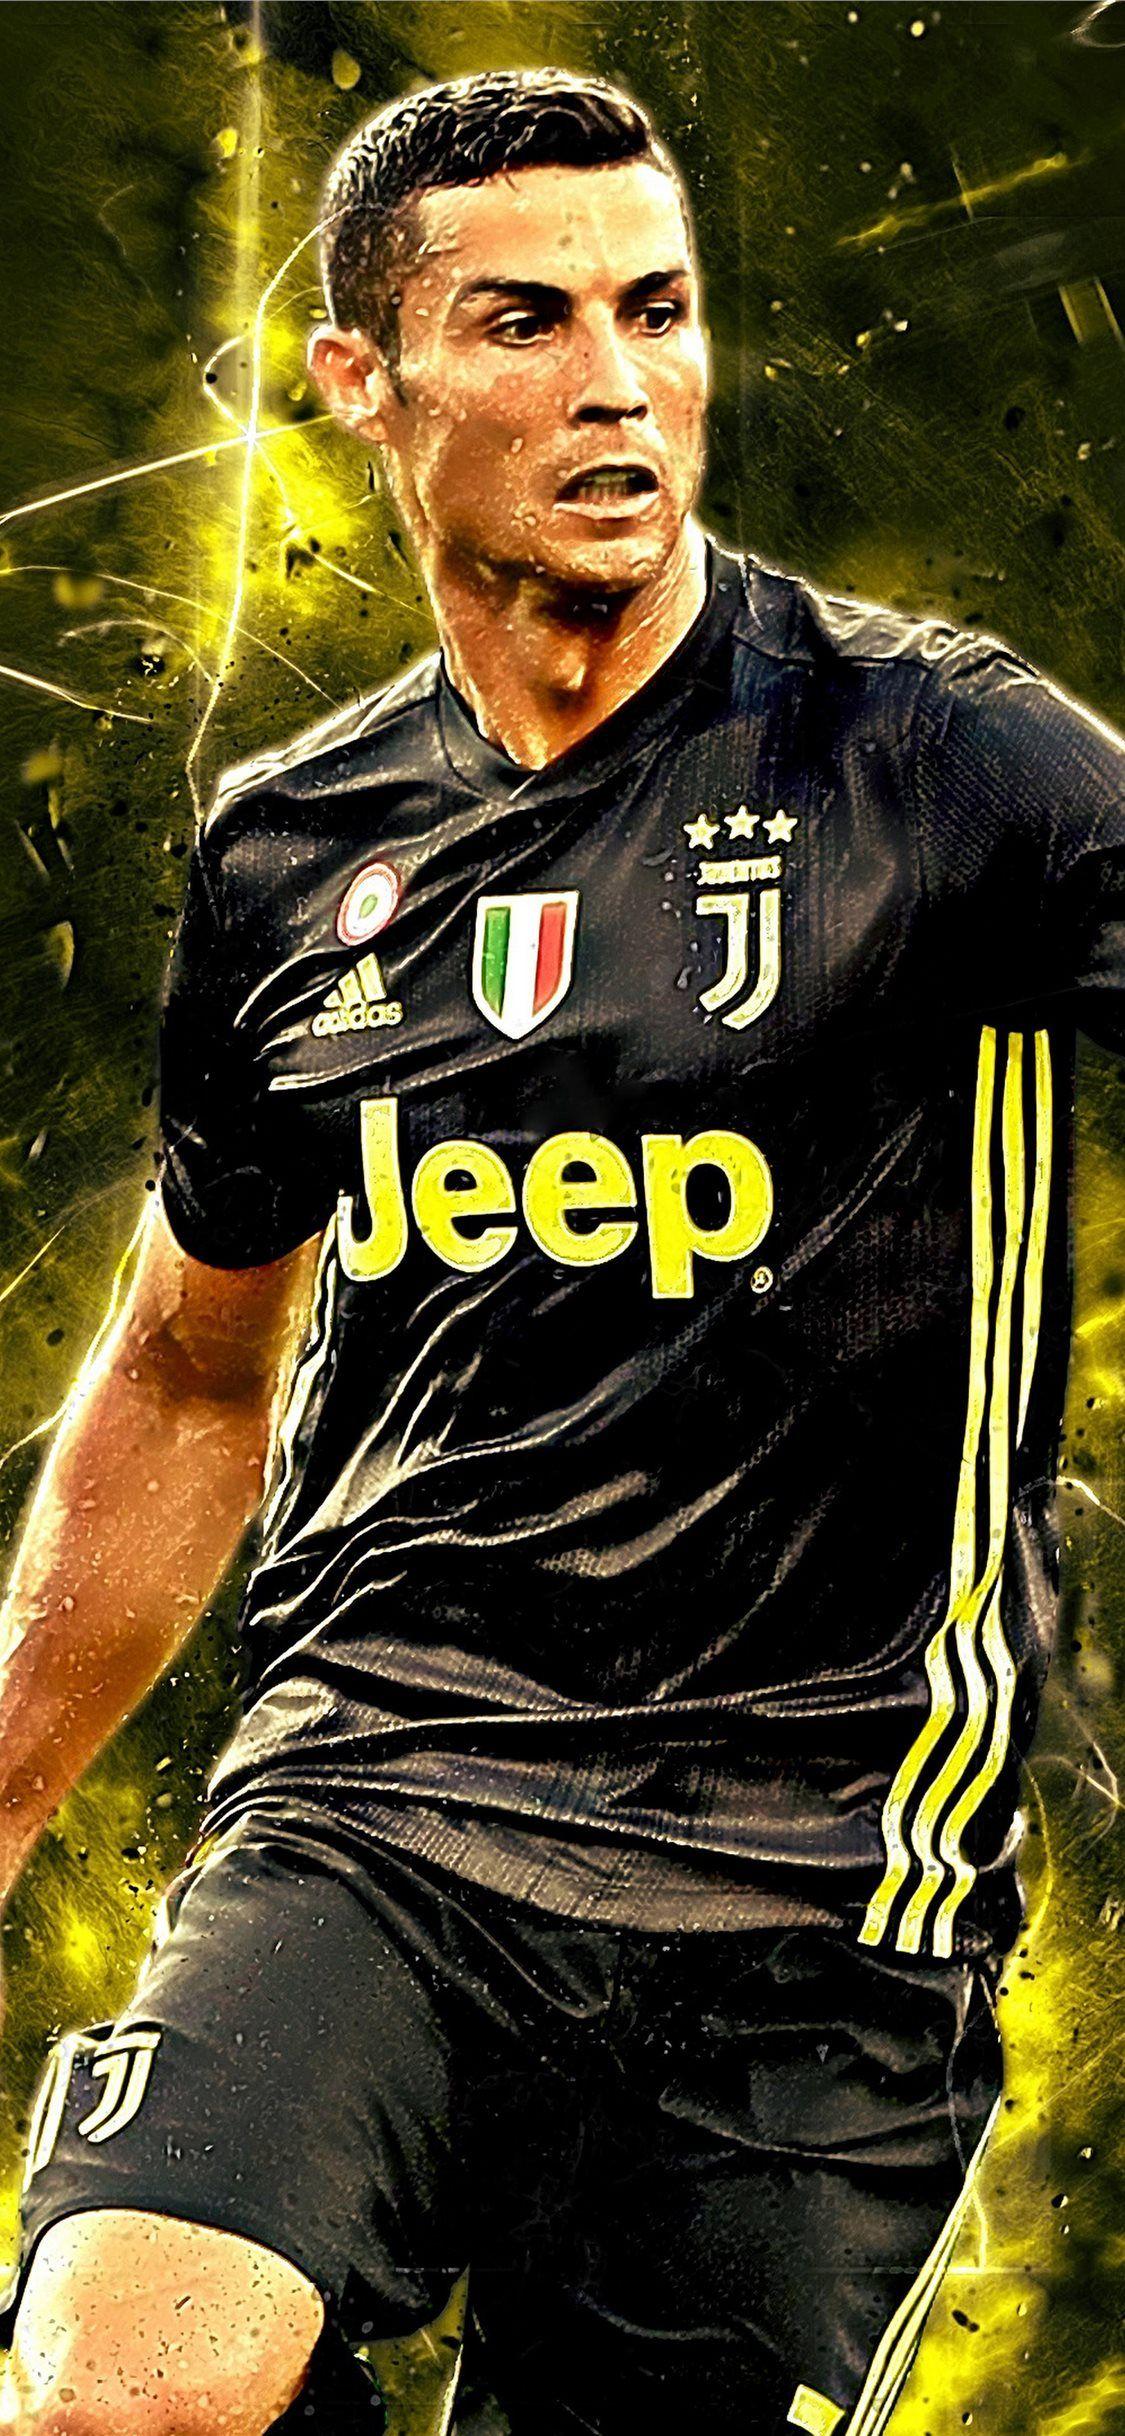 Cristiano Ronaldo Football 4K CristianoRonaldo trends